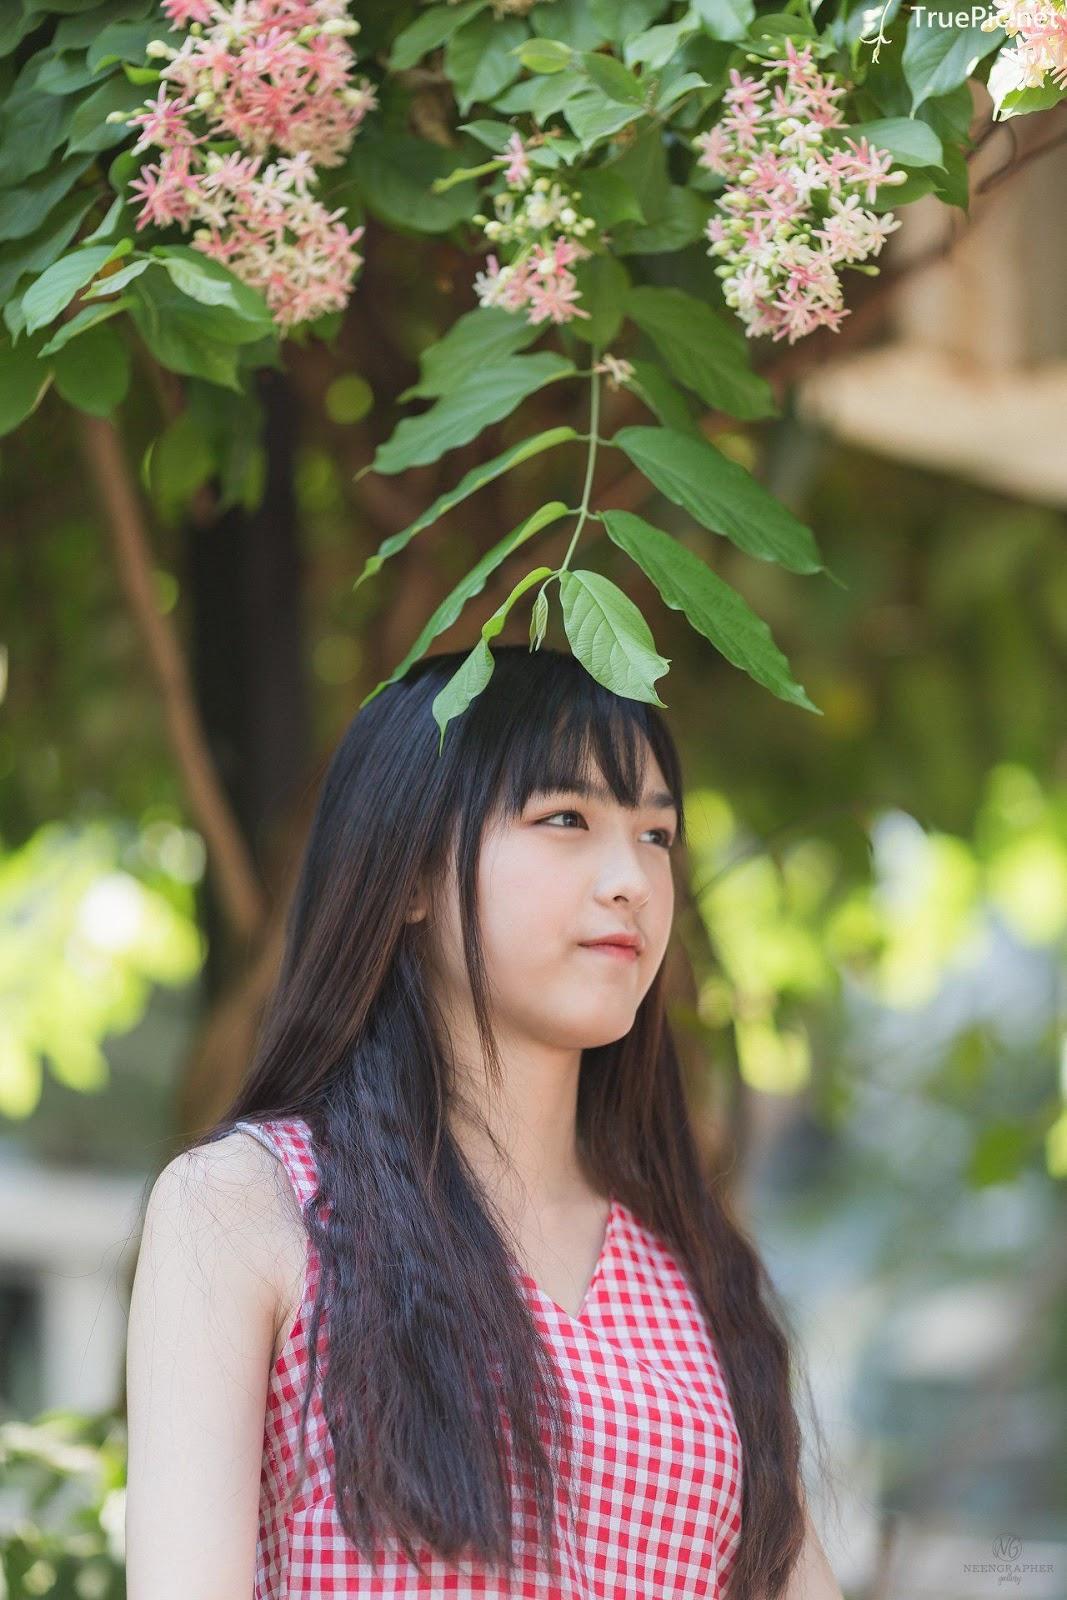 Image-Thailand-Cute-Model-Emma-Panisara–Album-Emma-Bright-Sunday-TruePic.net- Picture-3